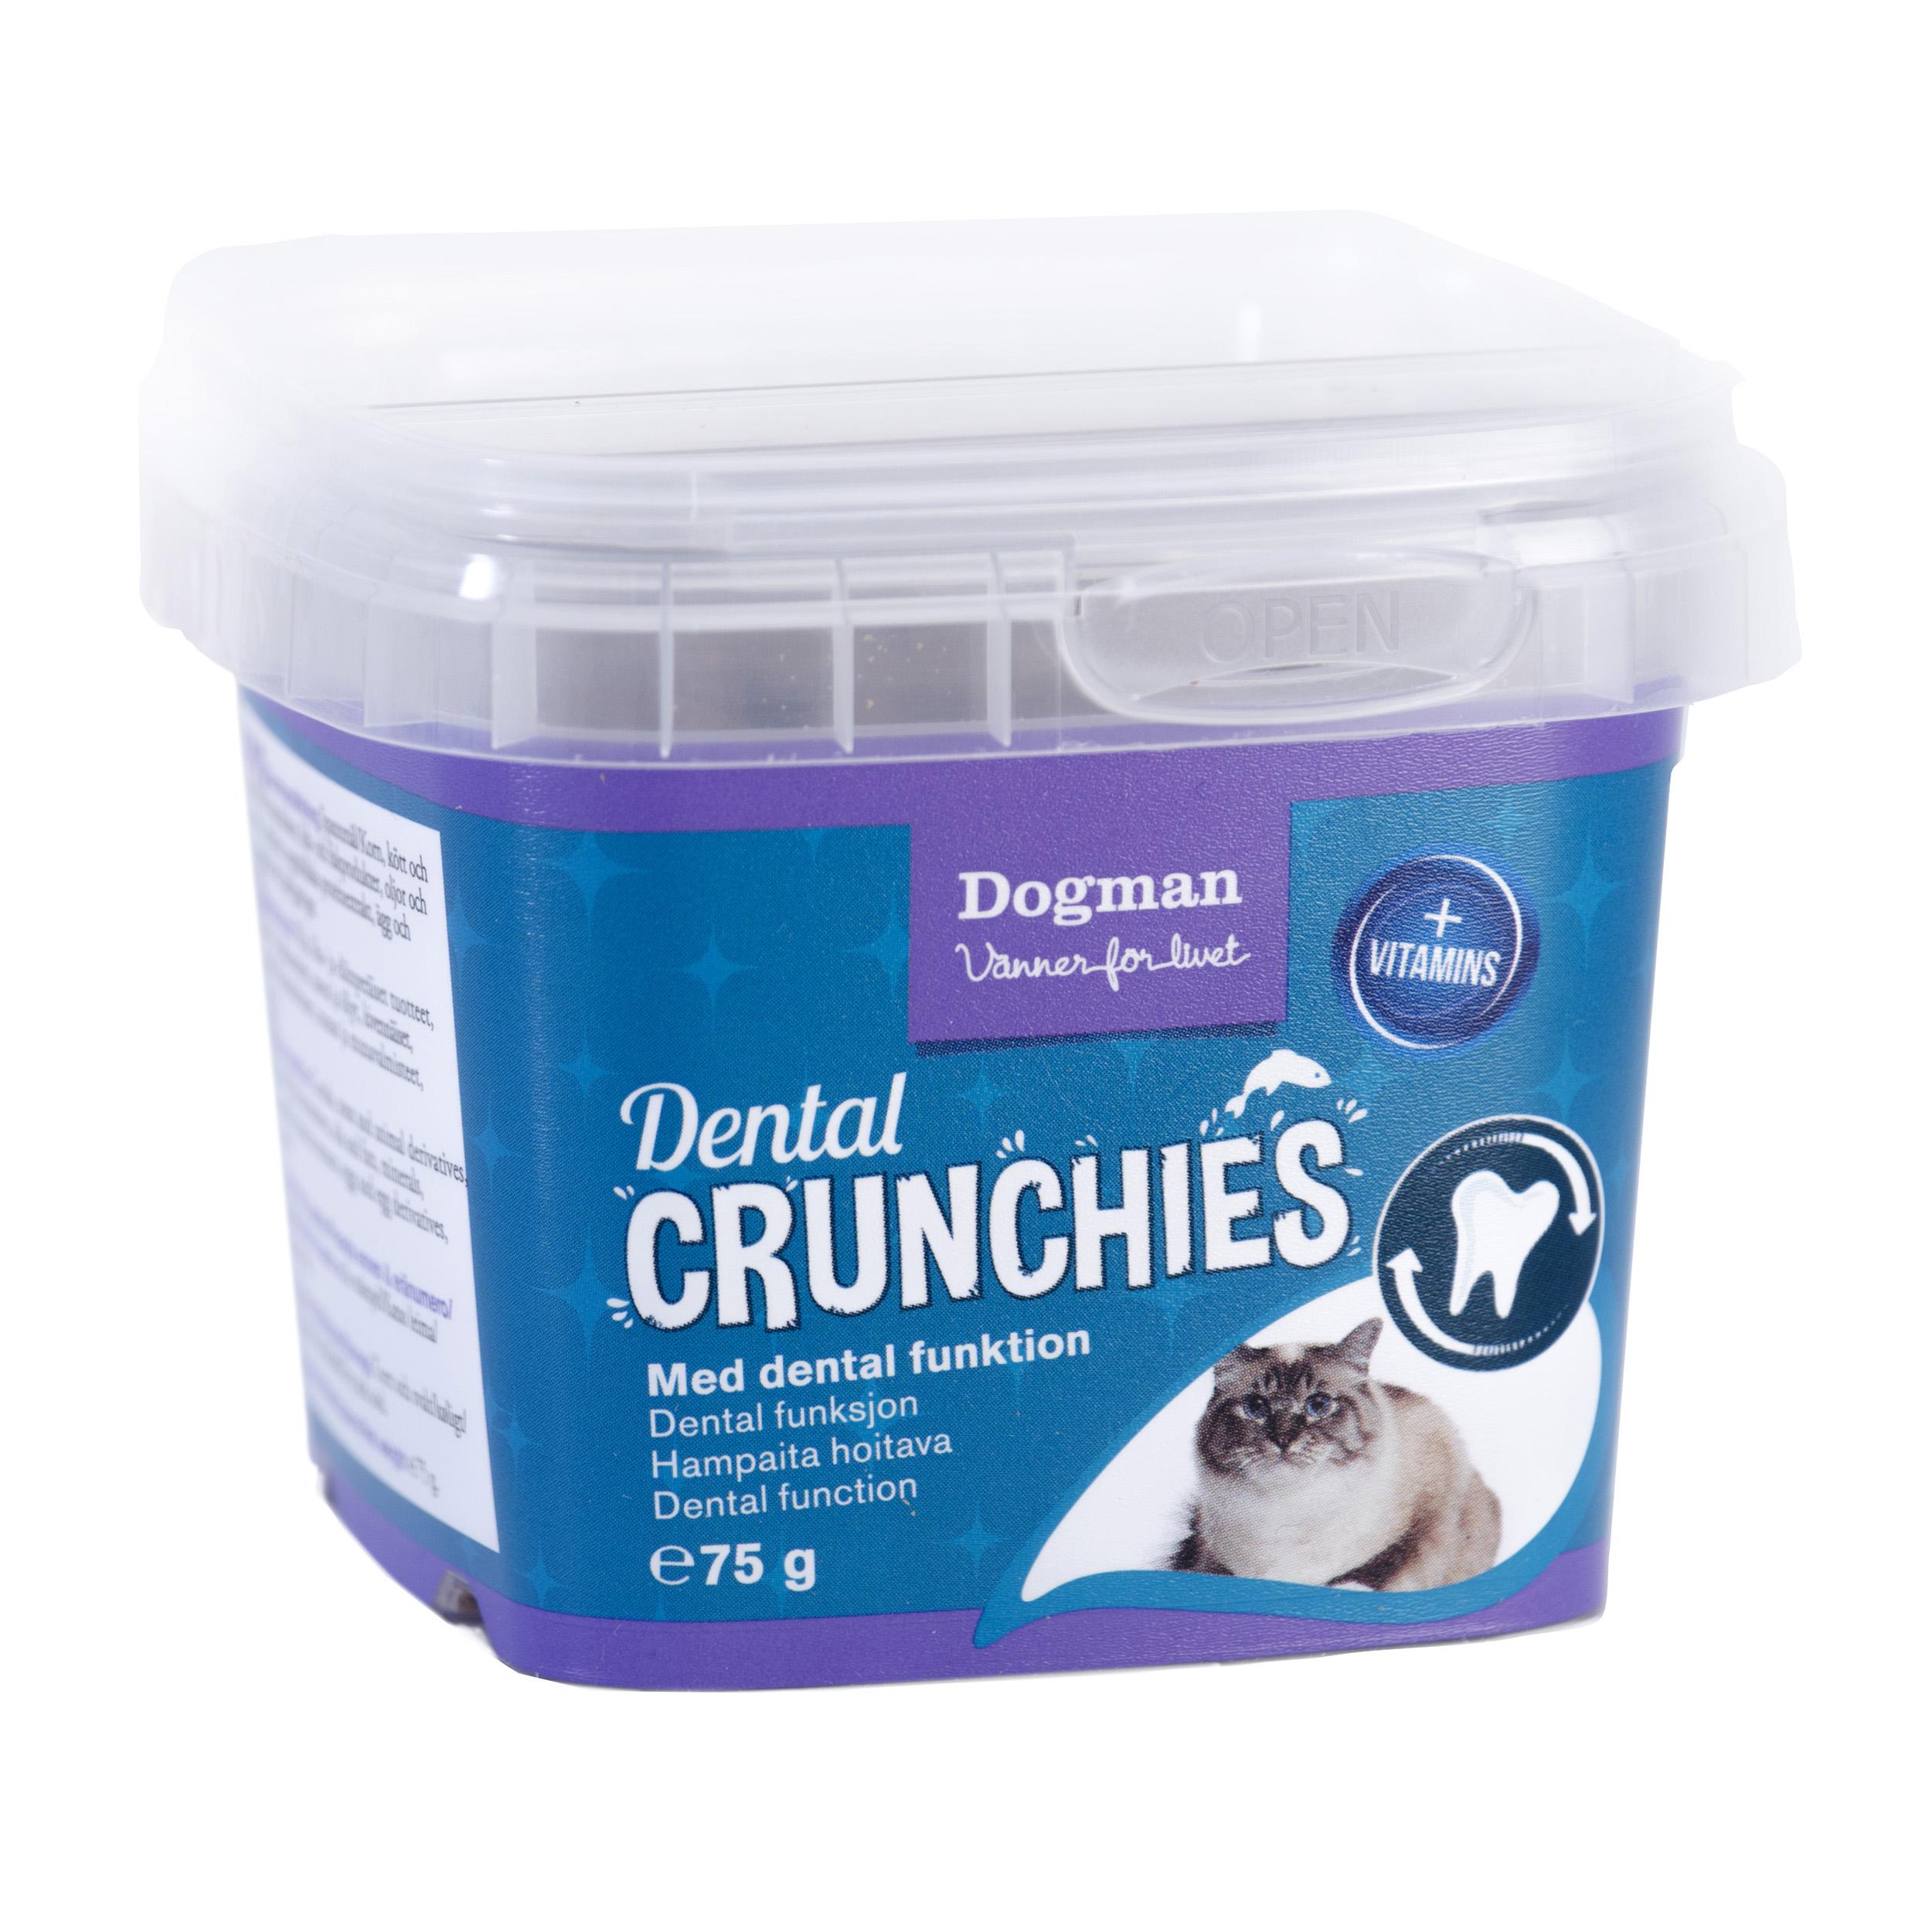 Dogman Crunchies dental 75g